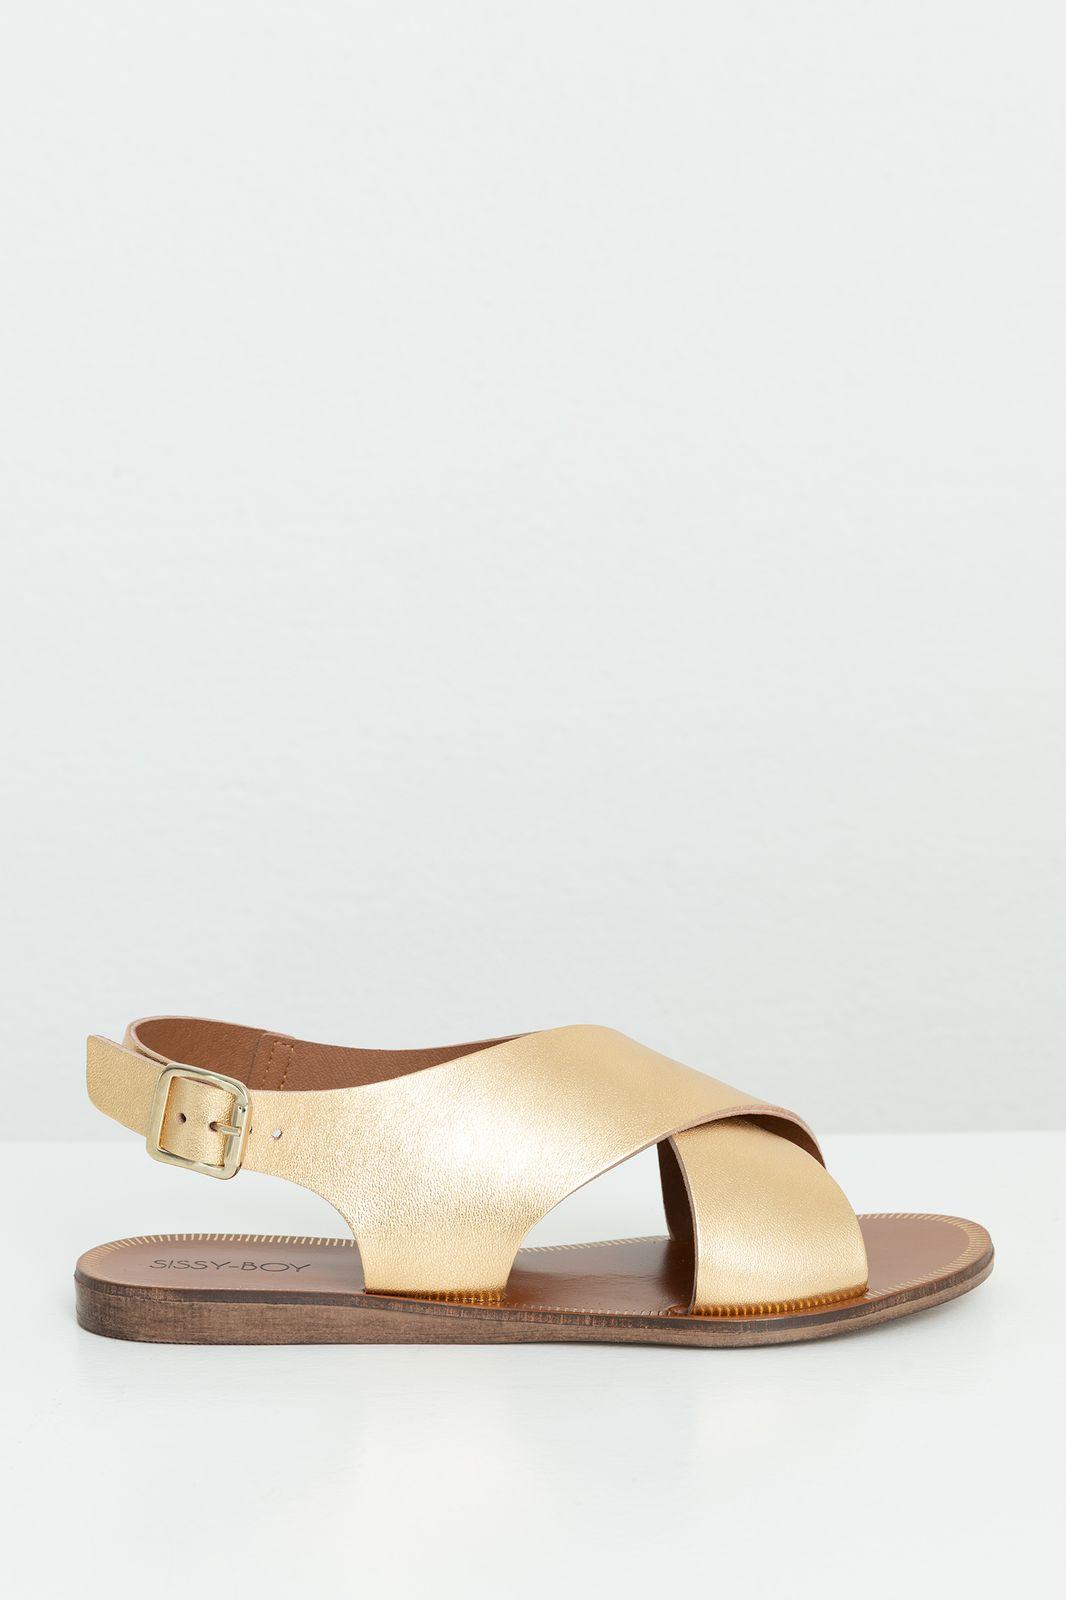 Goudkleurige leren sandaal met kruisbanden - Dames | Sissy-Boy